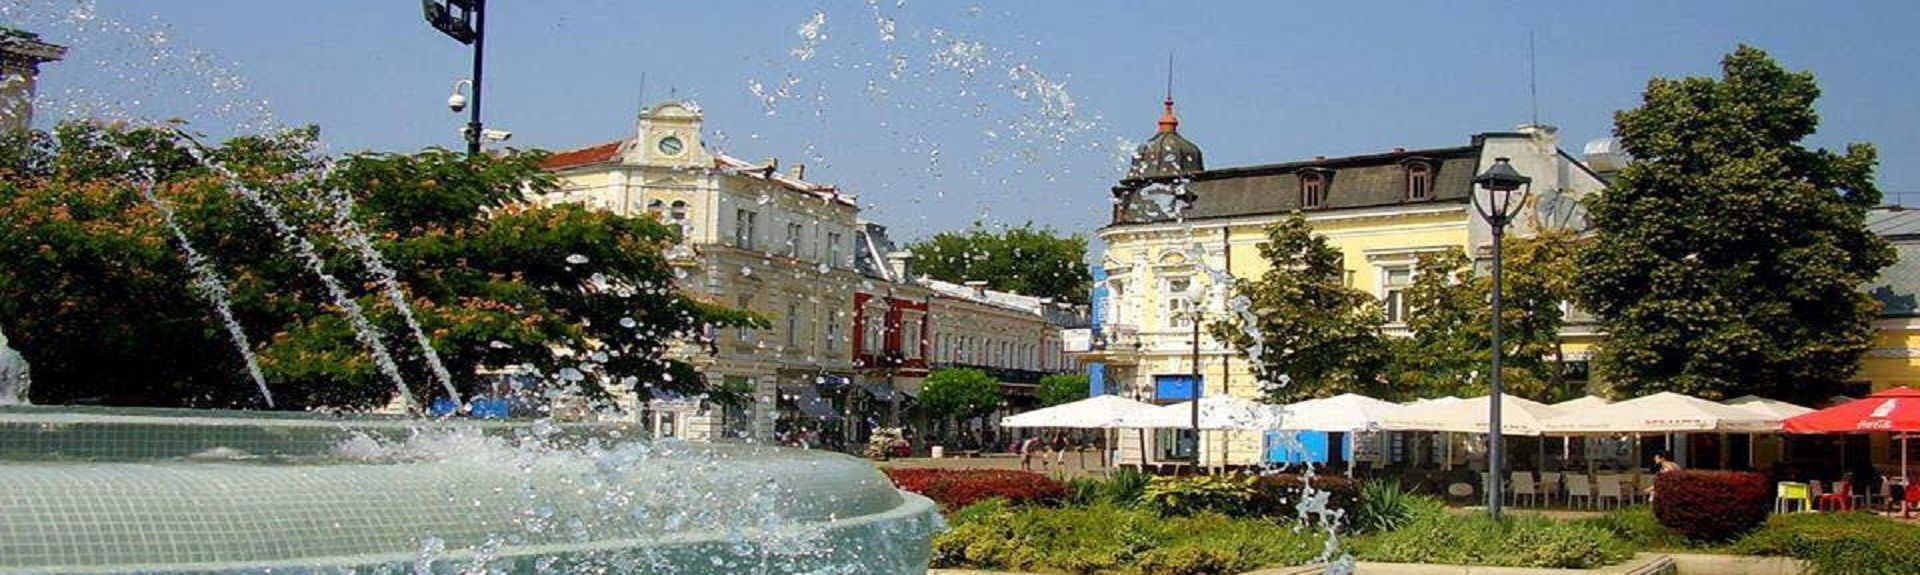 Pantheon of National Revival Heroes, Ruse, Bulgaria